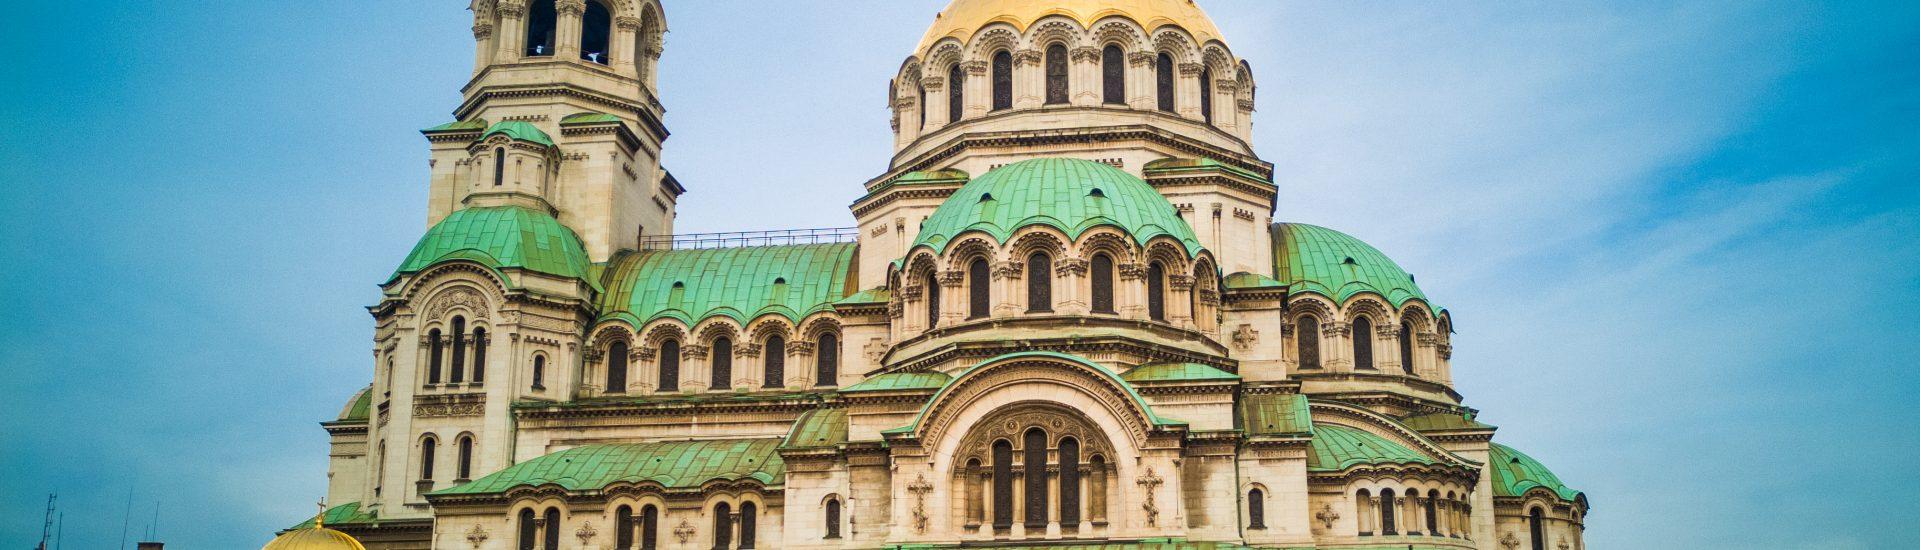 Cattedrale-di-Aleksandr-Nevskij